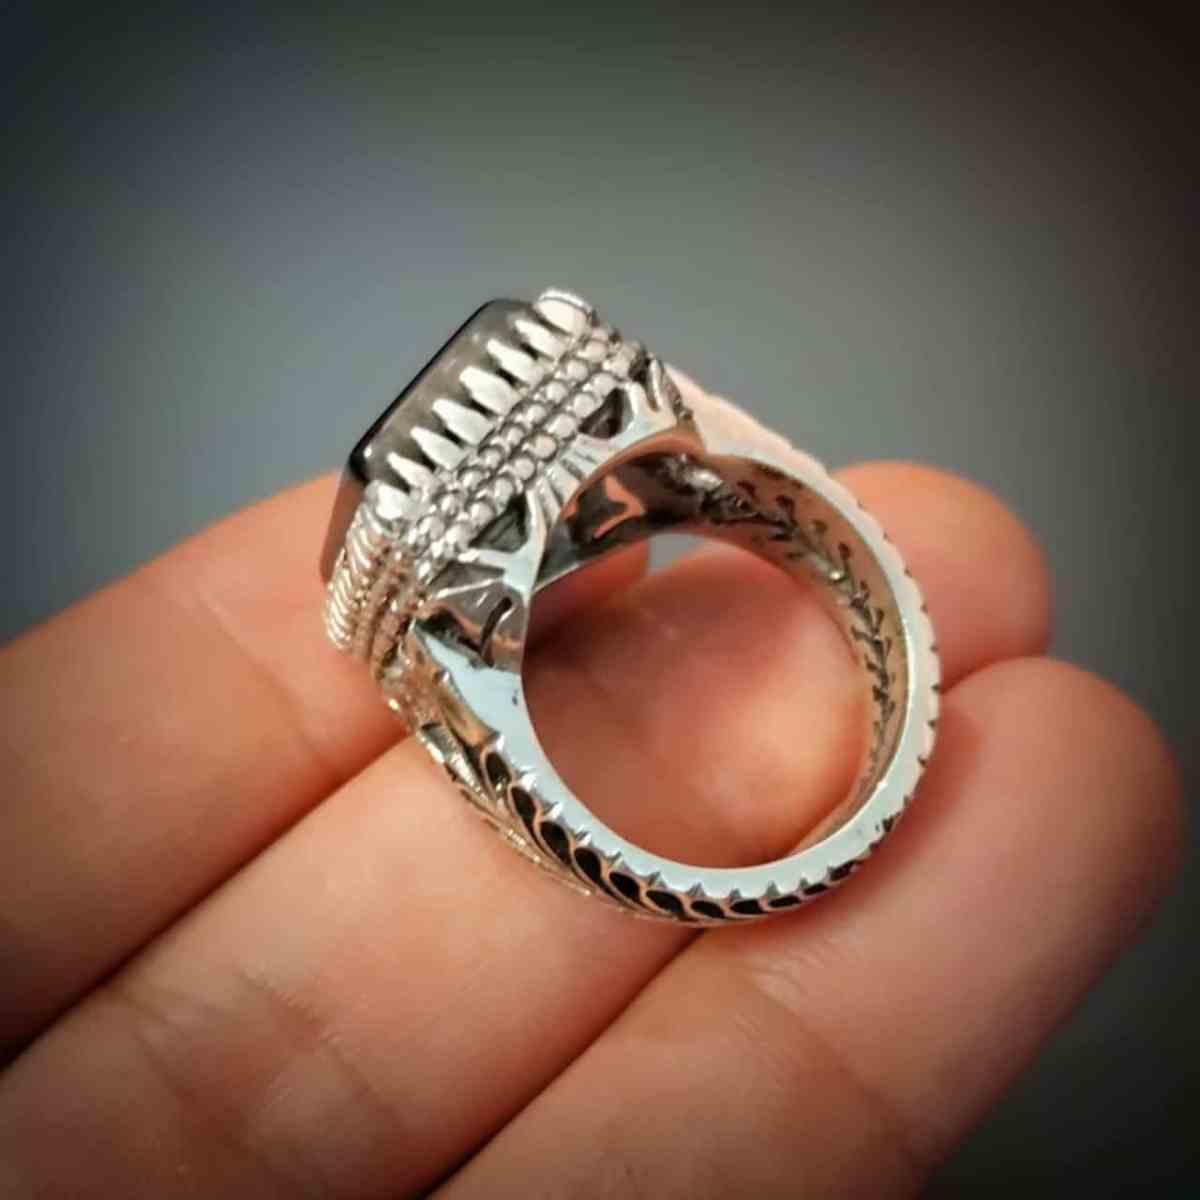 Black Aqeeq 925 Silver Handmade Ring 1 natural gemstones pakistan + 925 silver jewelry online